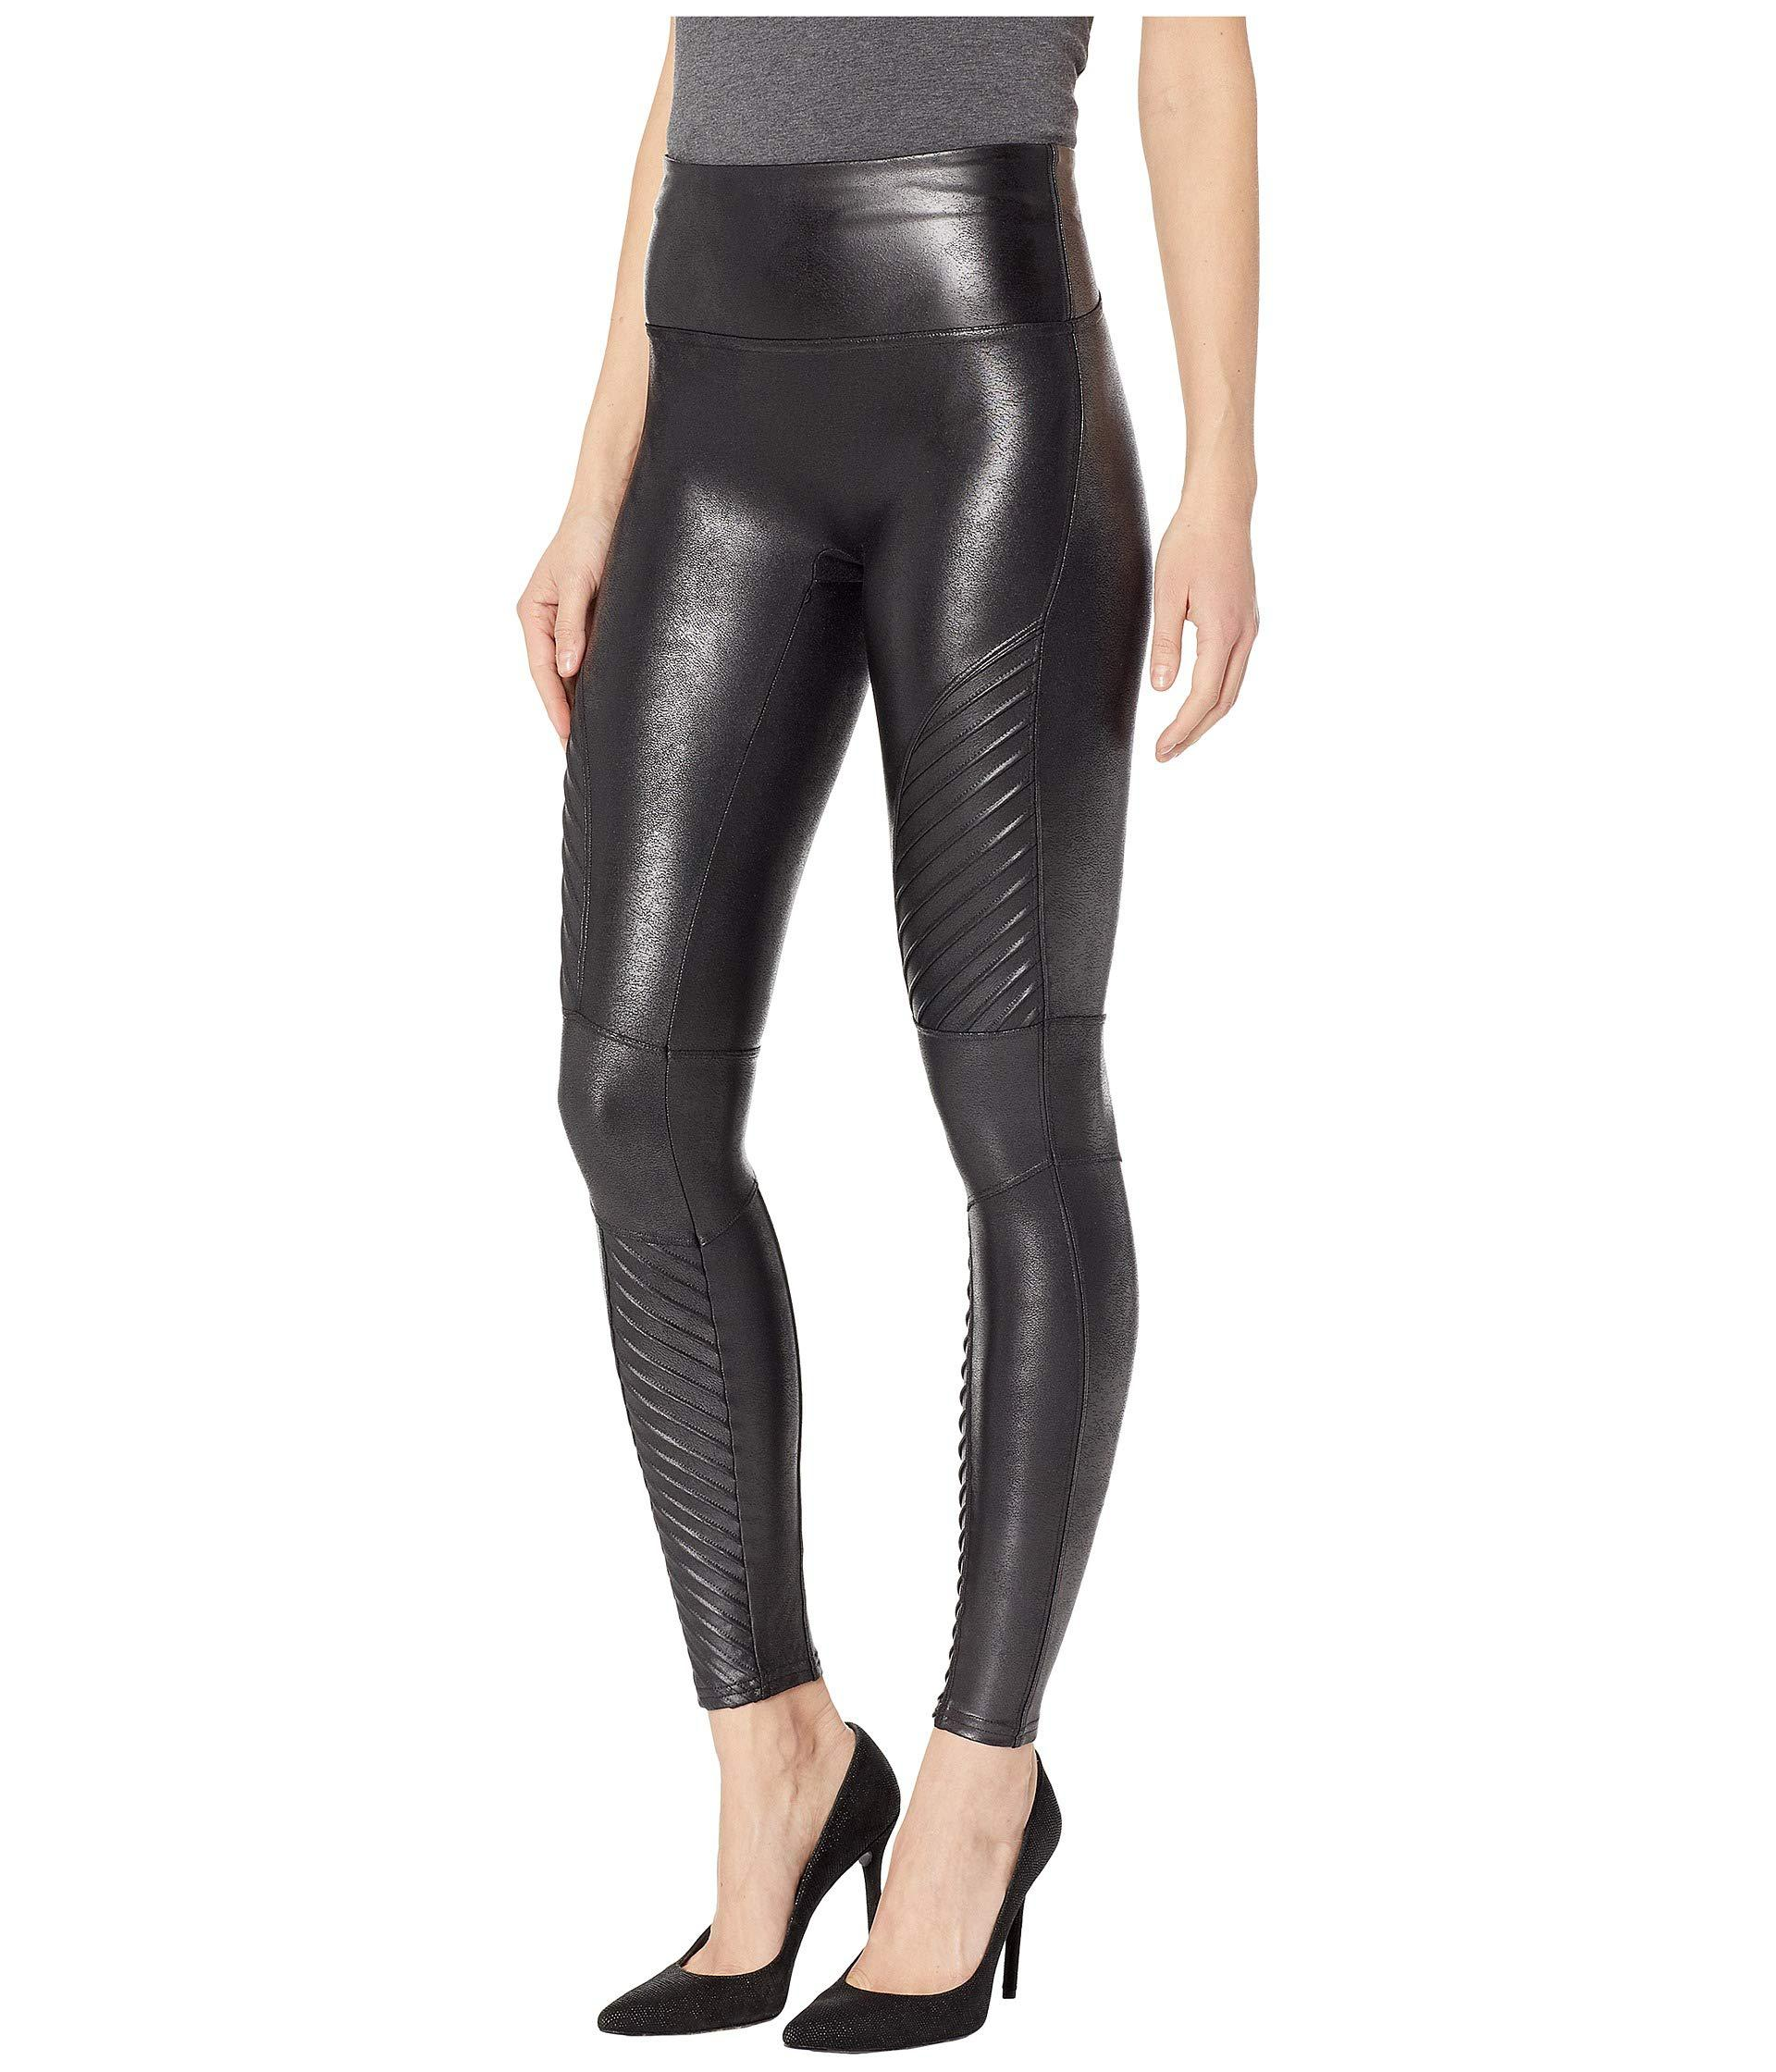 Lyst Spanx Faux Leather Leggings Moto Petite Black Women S